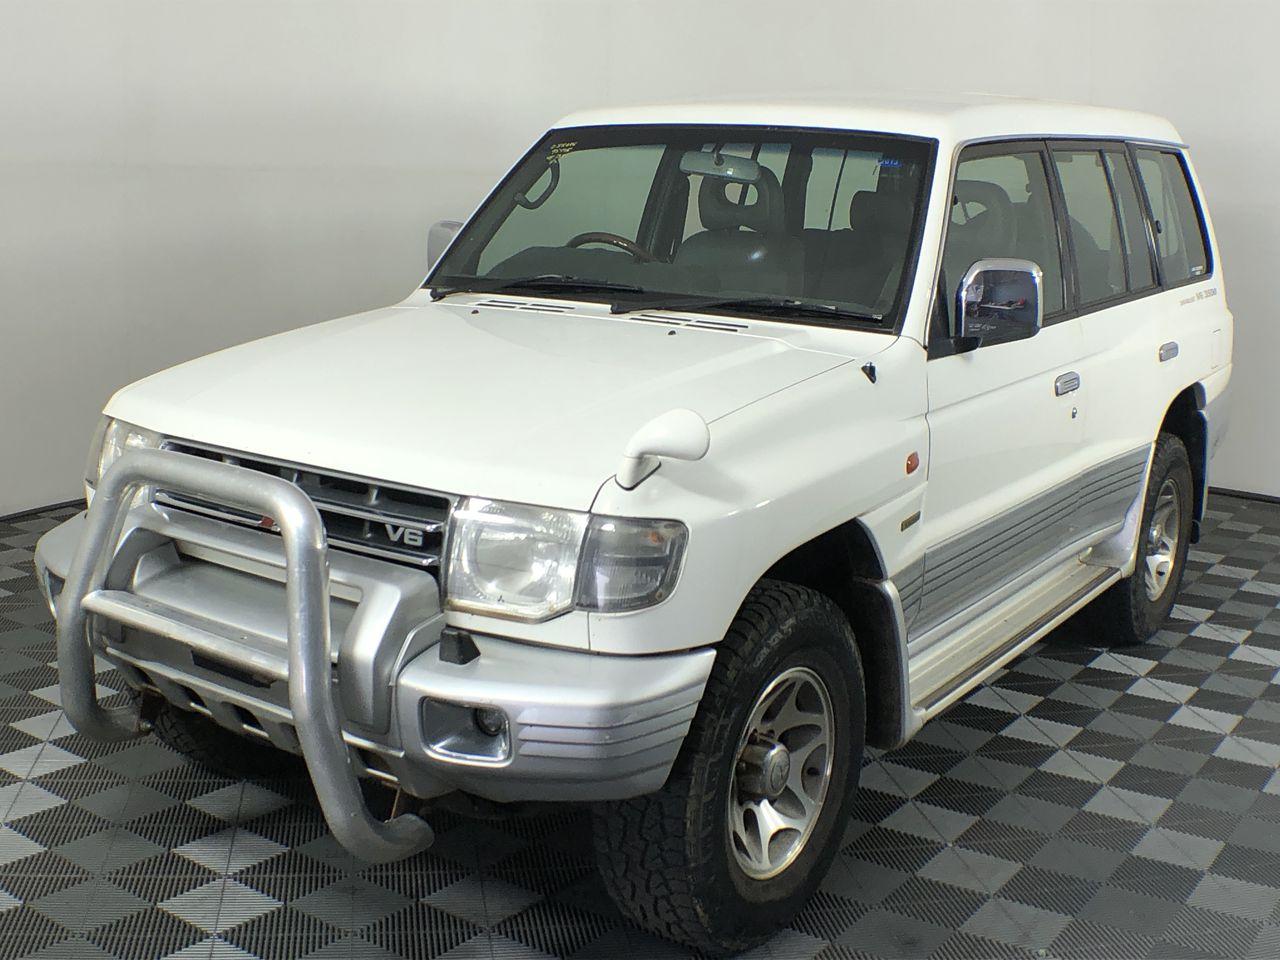 1999 Mitsubishi Pajero EXCEED GLS LWB (4x4) NL Manual 7 Seats Wagon